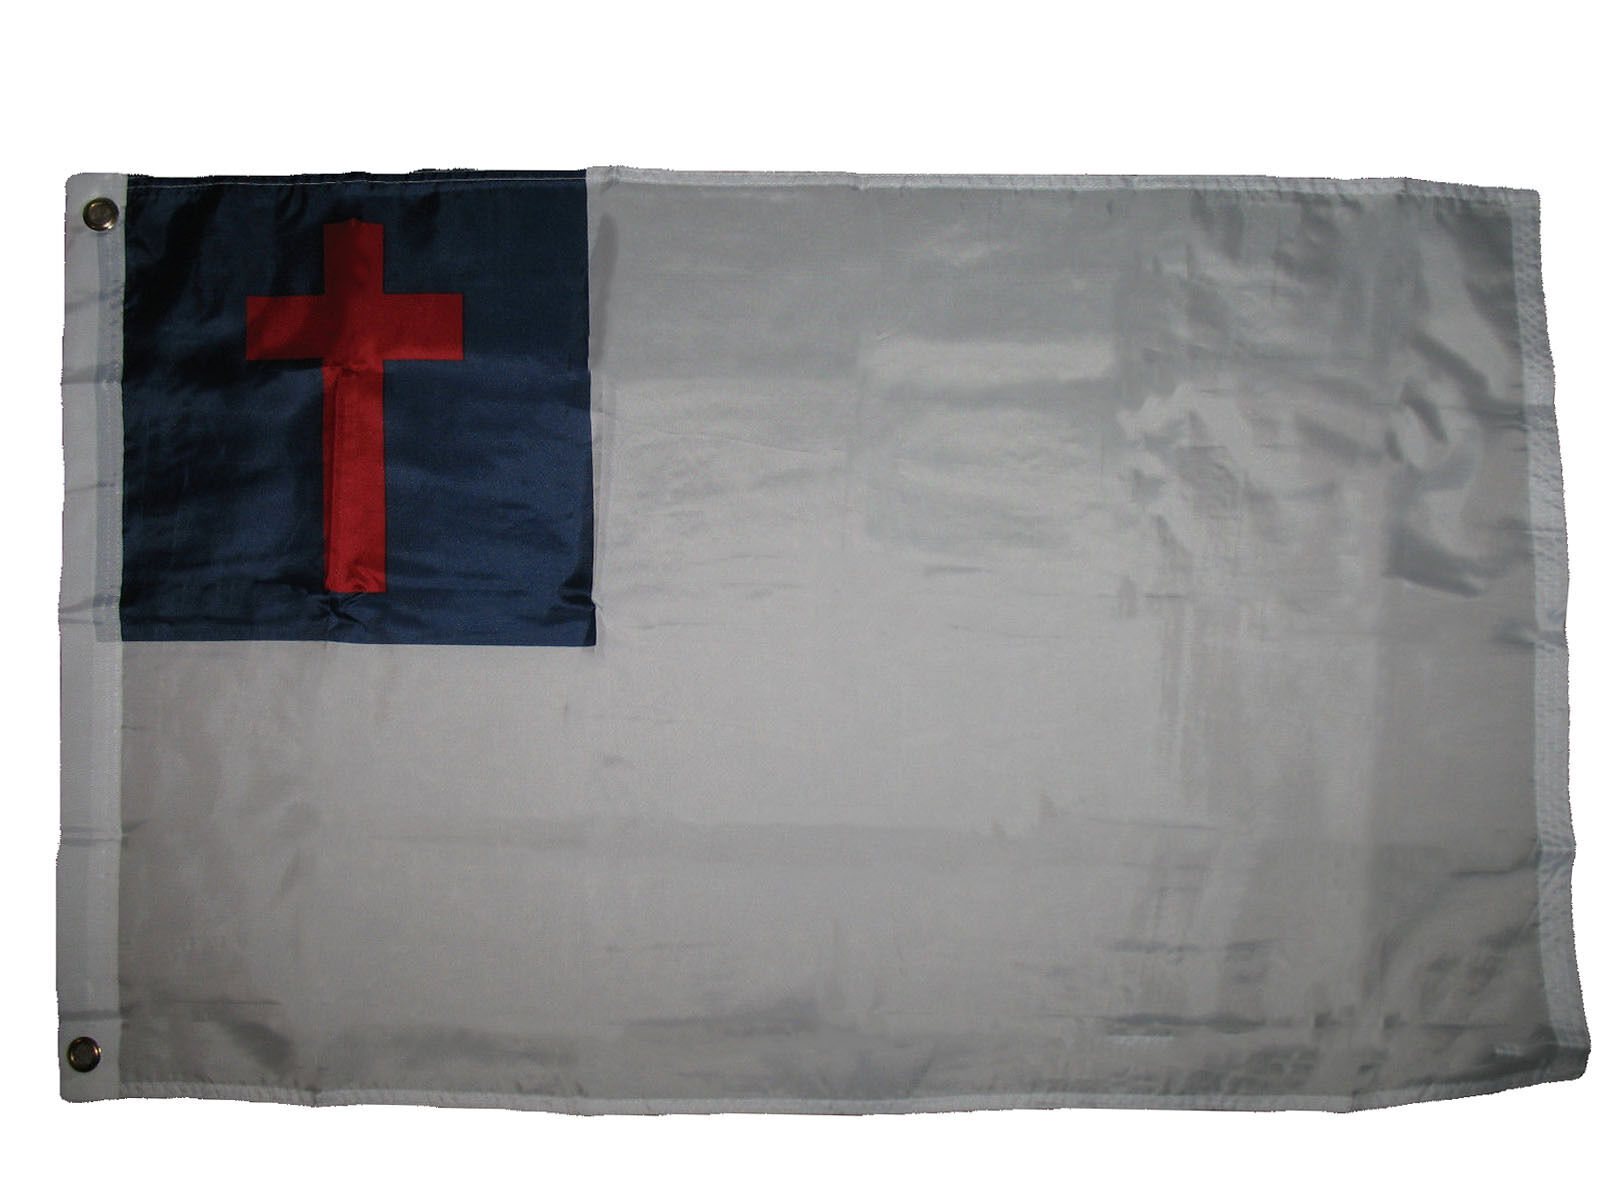 2x3 Christian Flag 2'x3' House Banner Grommets Super Polyest